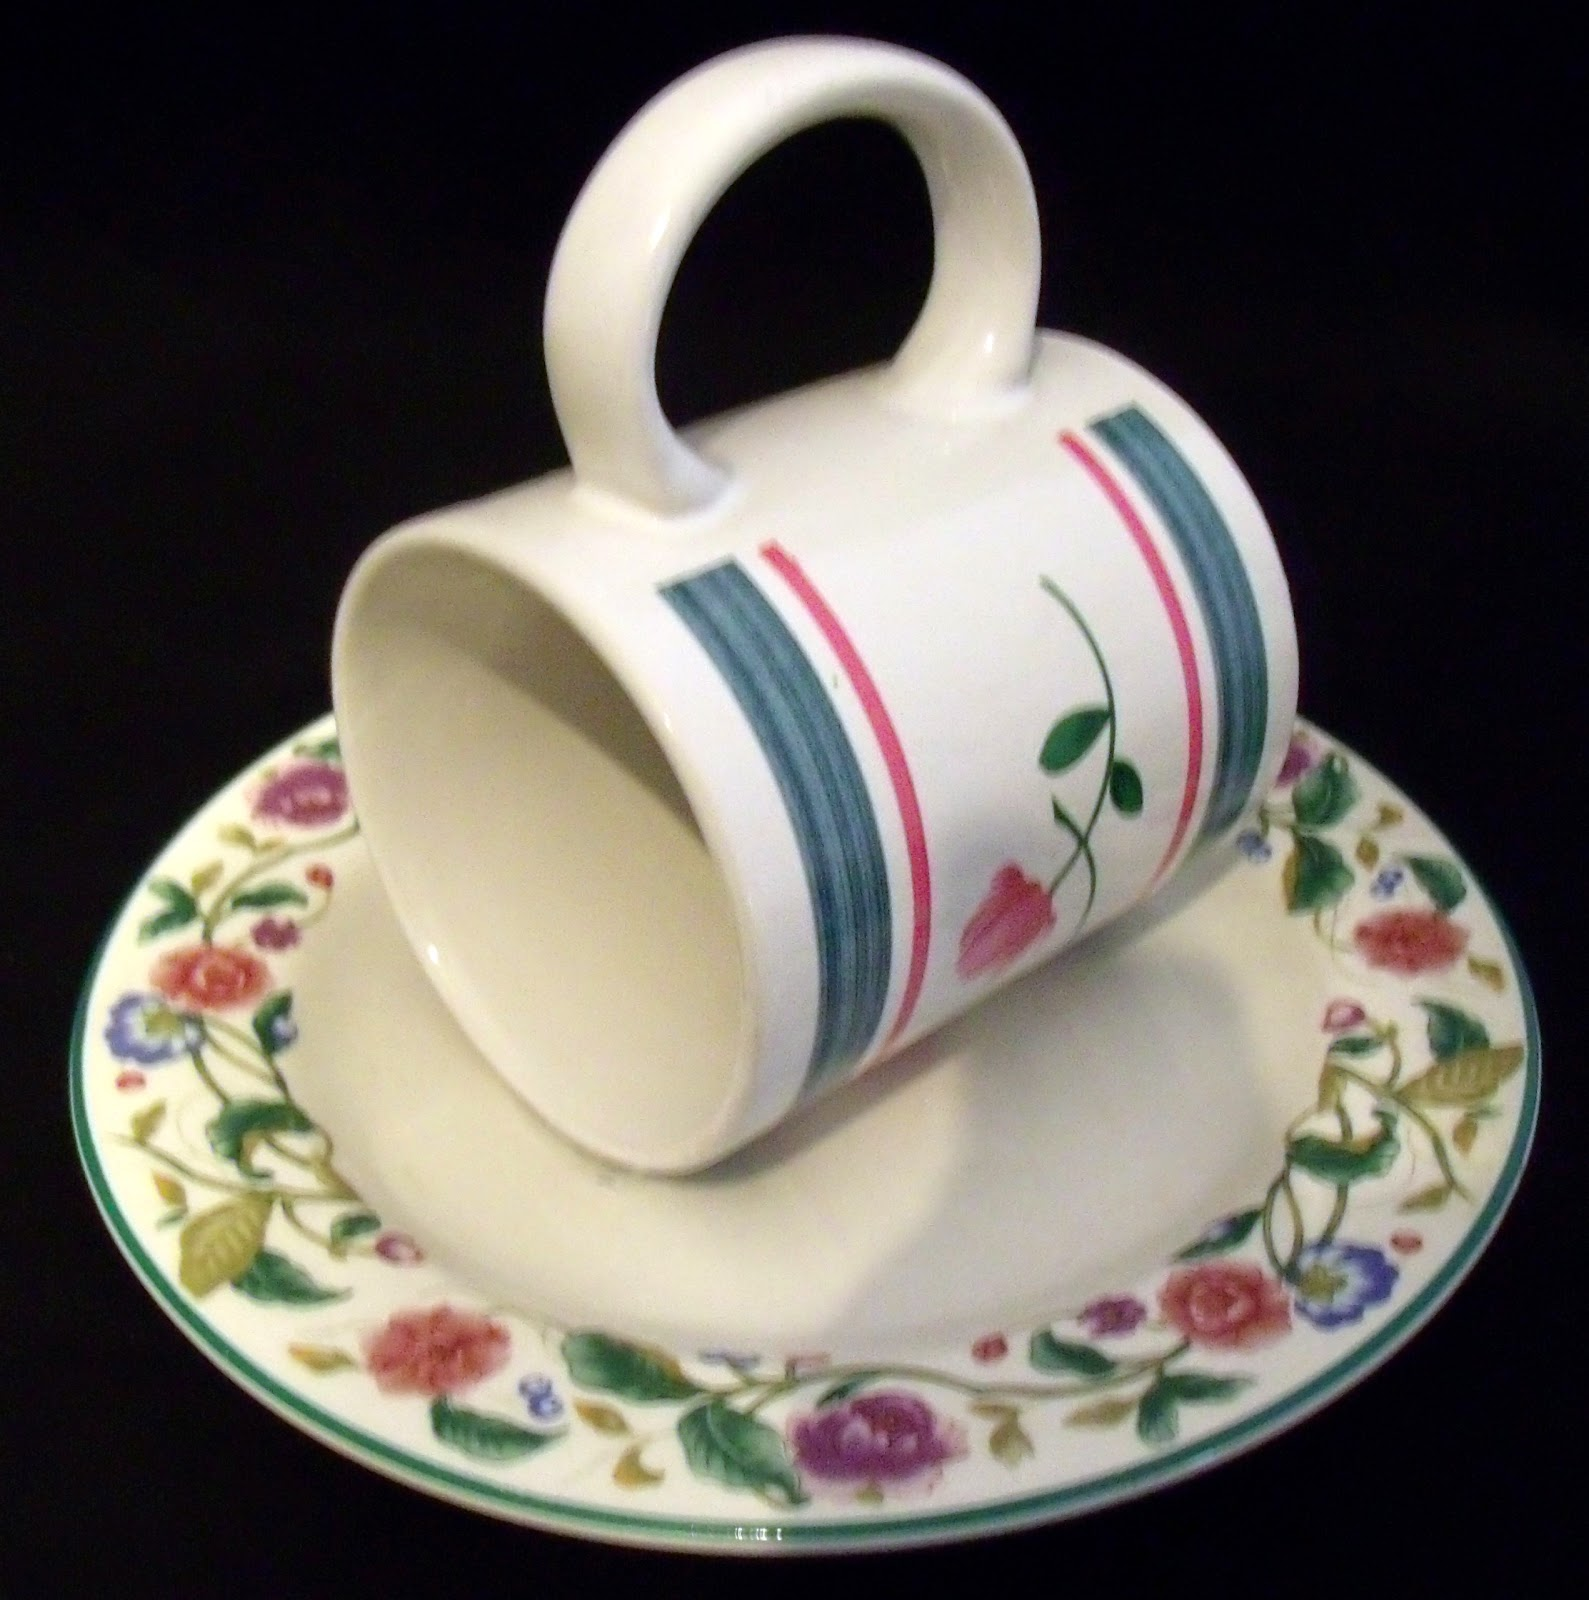 Struggleville upcycled coffee mug bird feeder